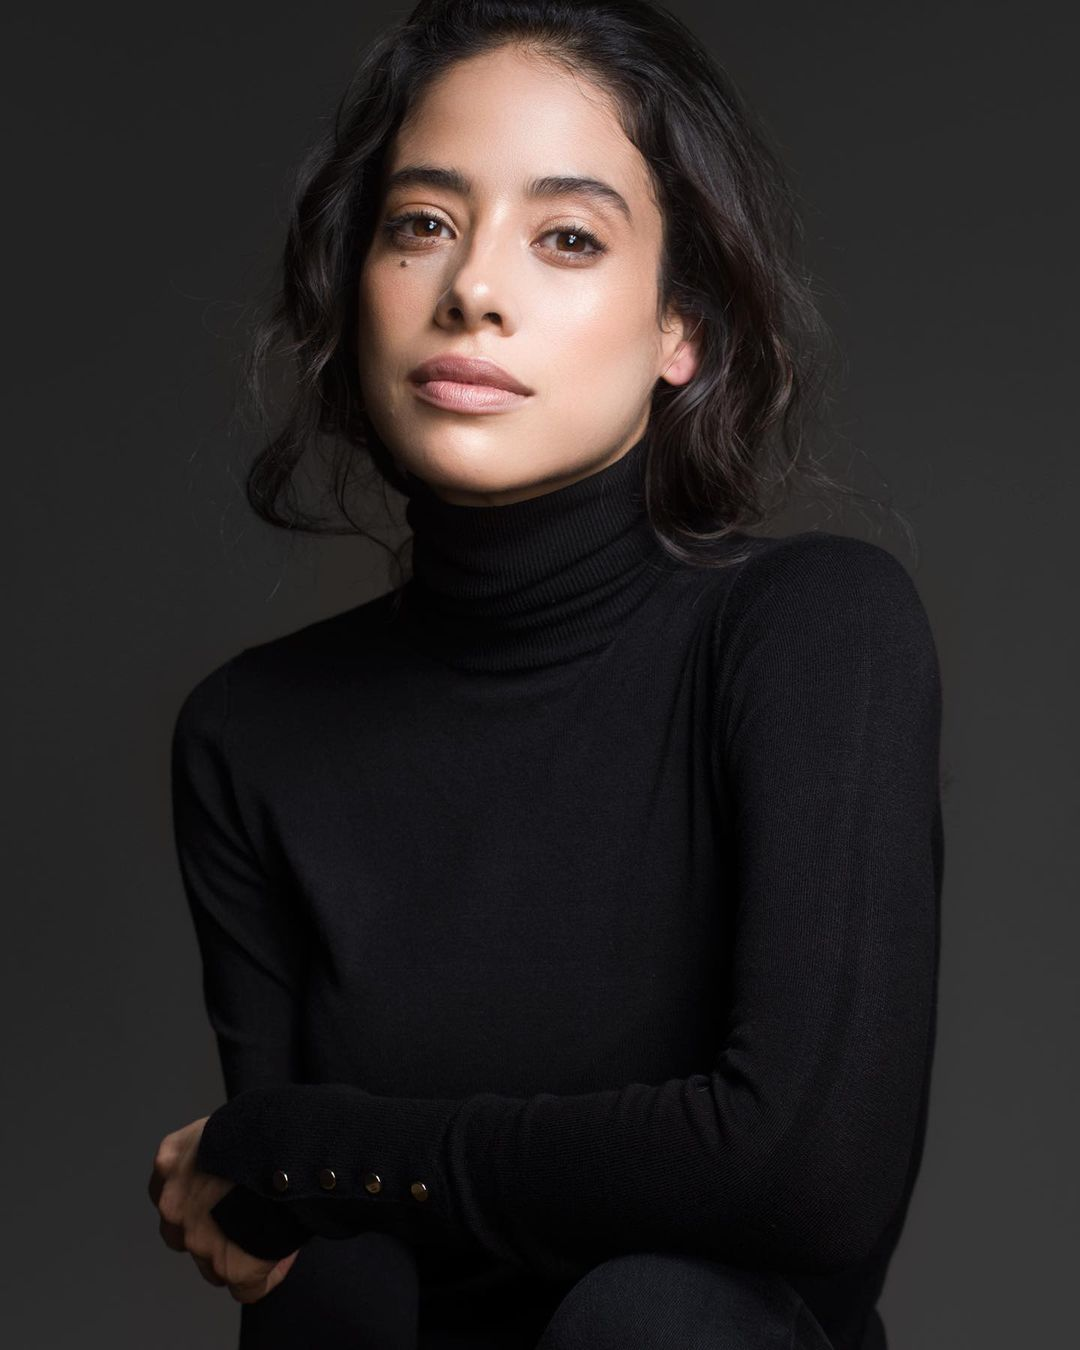 Fátima Molina Mexican Actress